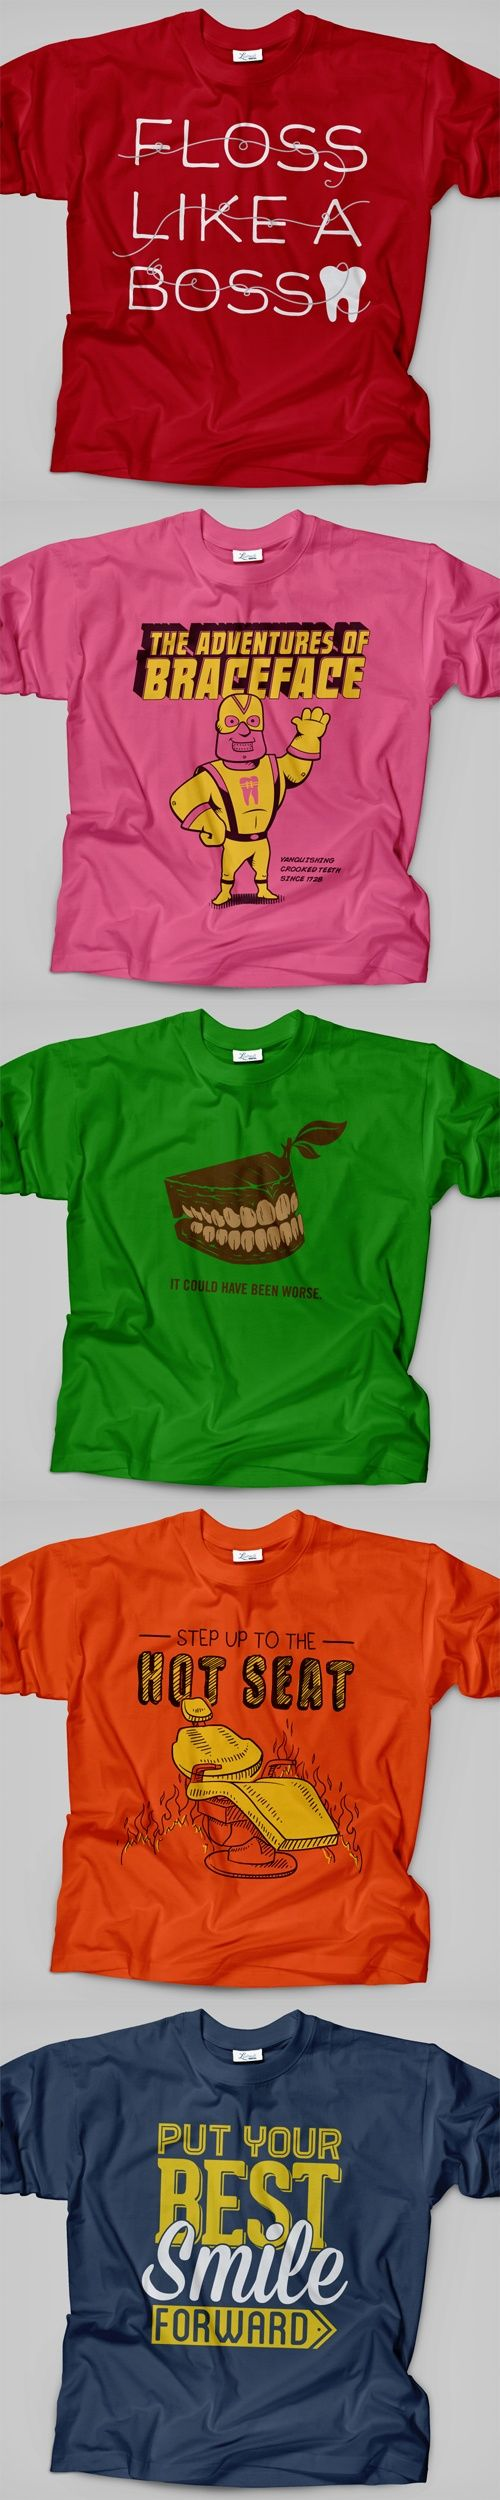 Dental & Orthodontic T-Shirts